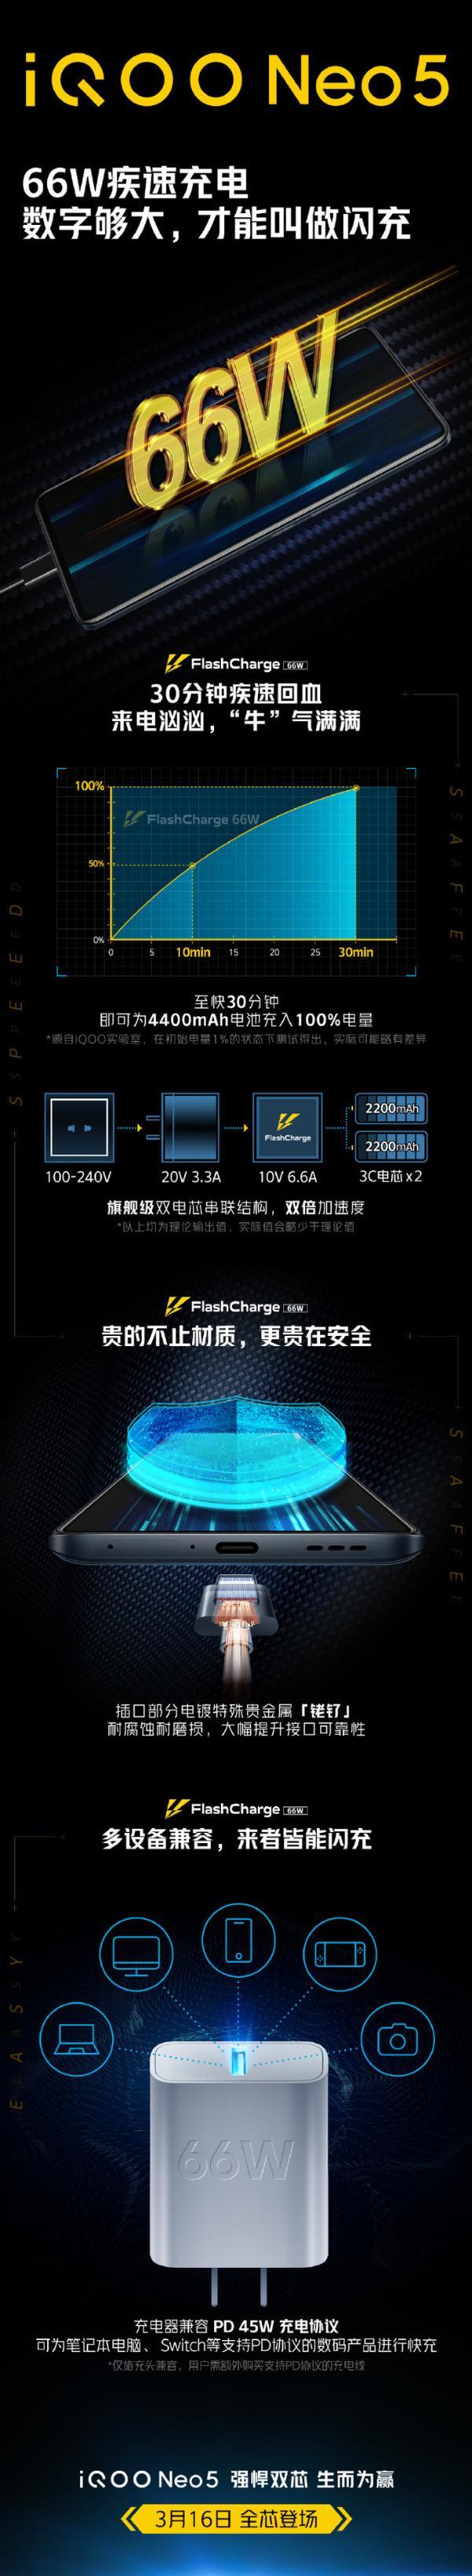 iQOO官方 :iQOO Neo5将配备66W闪充